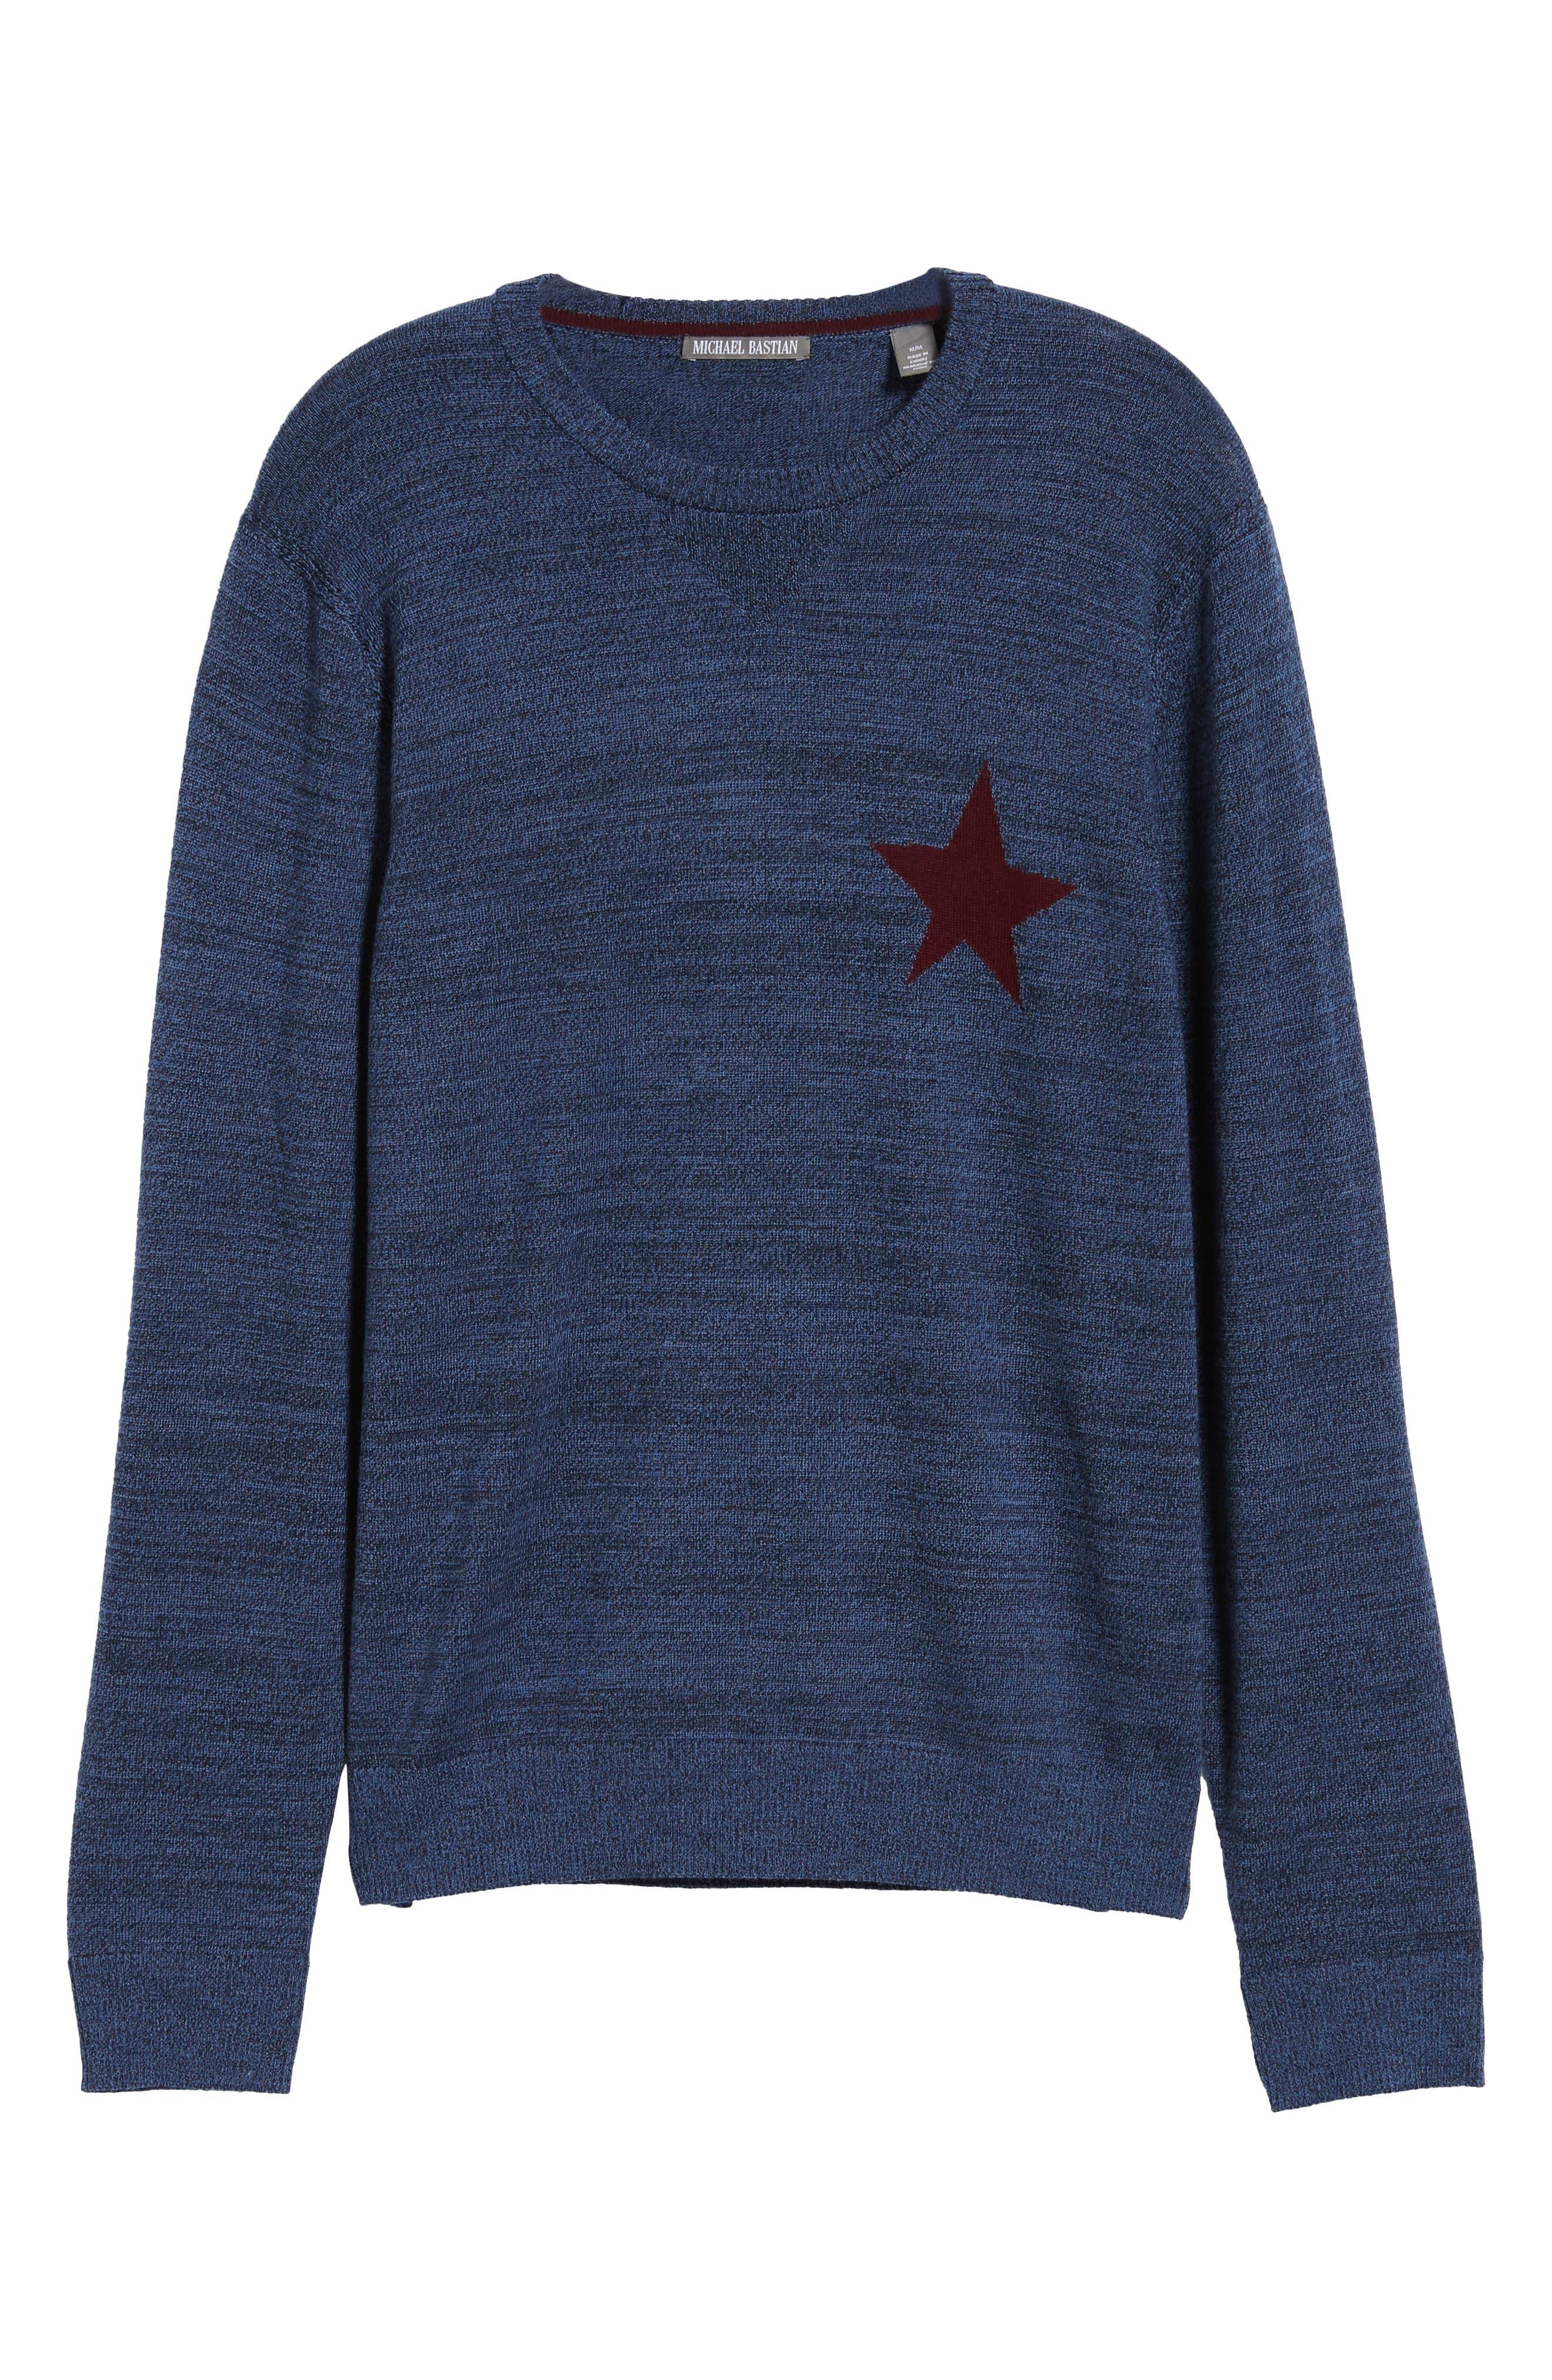 Intaria Star Merino Wool Sweater,                             Alternate thumbnail 6, color,                             BLUE